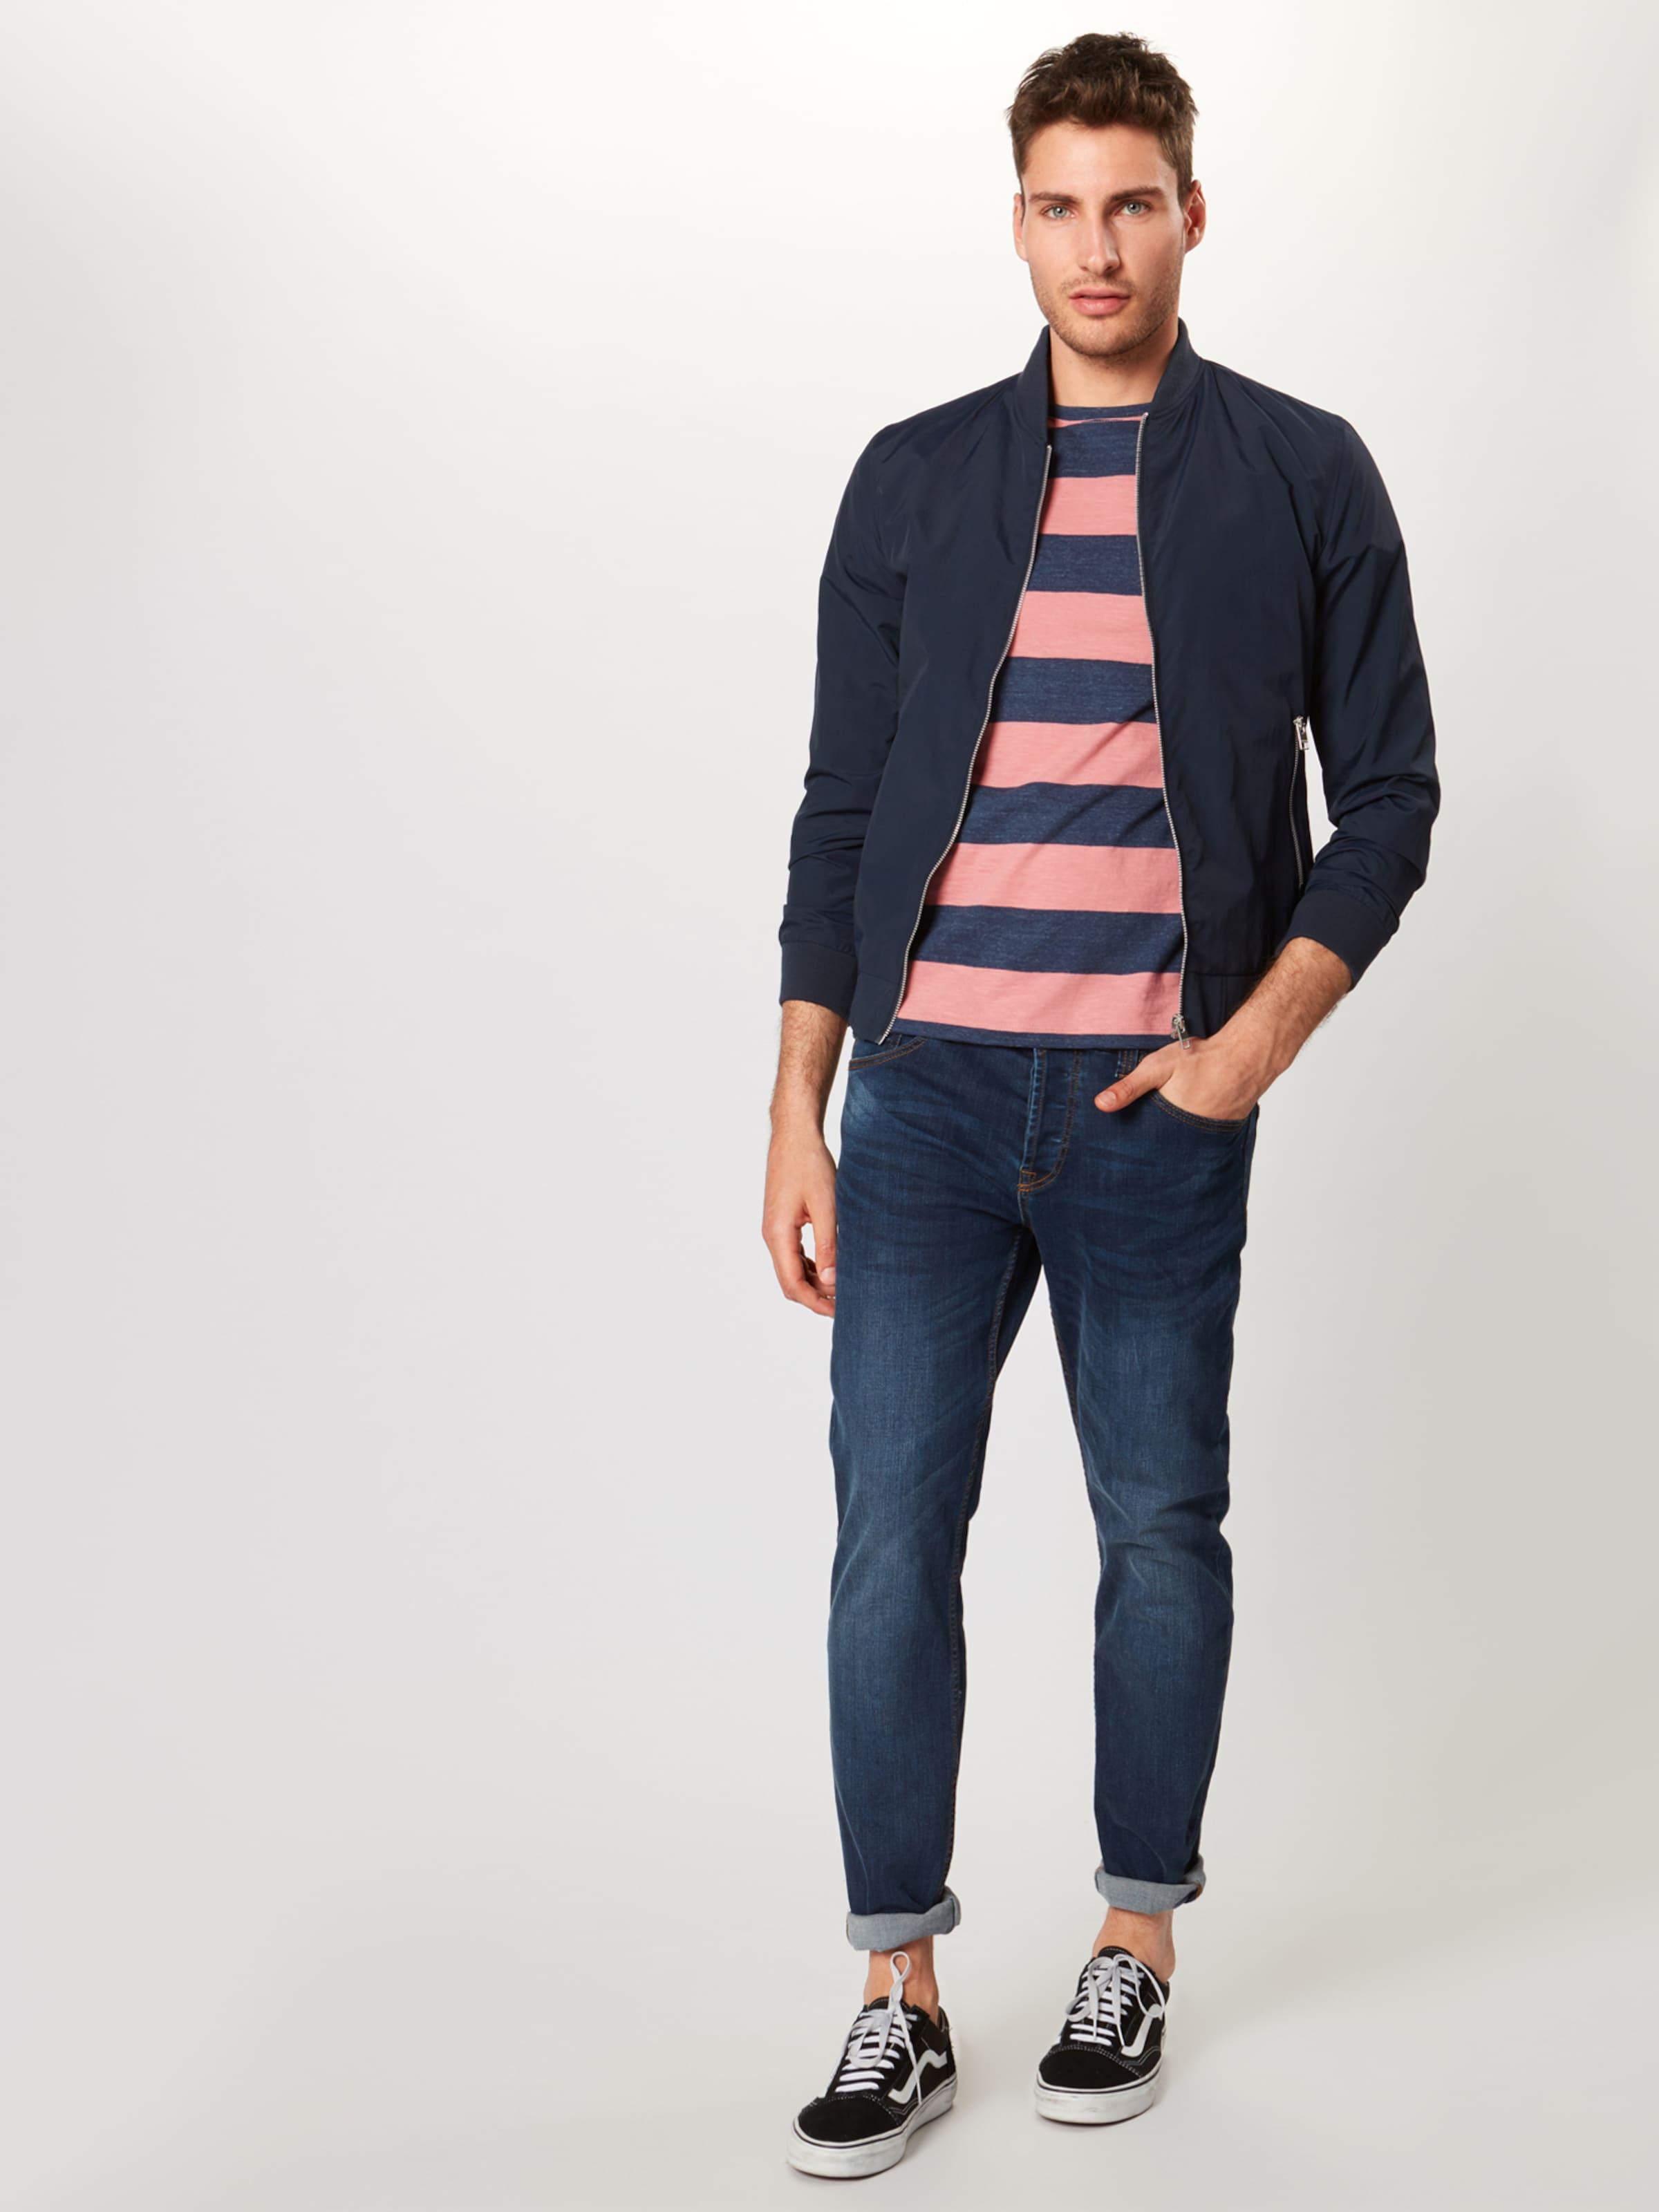 Esprit T BleuBlanc En shirt shirt En Esprit BleuBlanc Esprit shirt T T rxsBQCthod